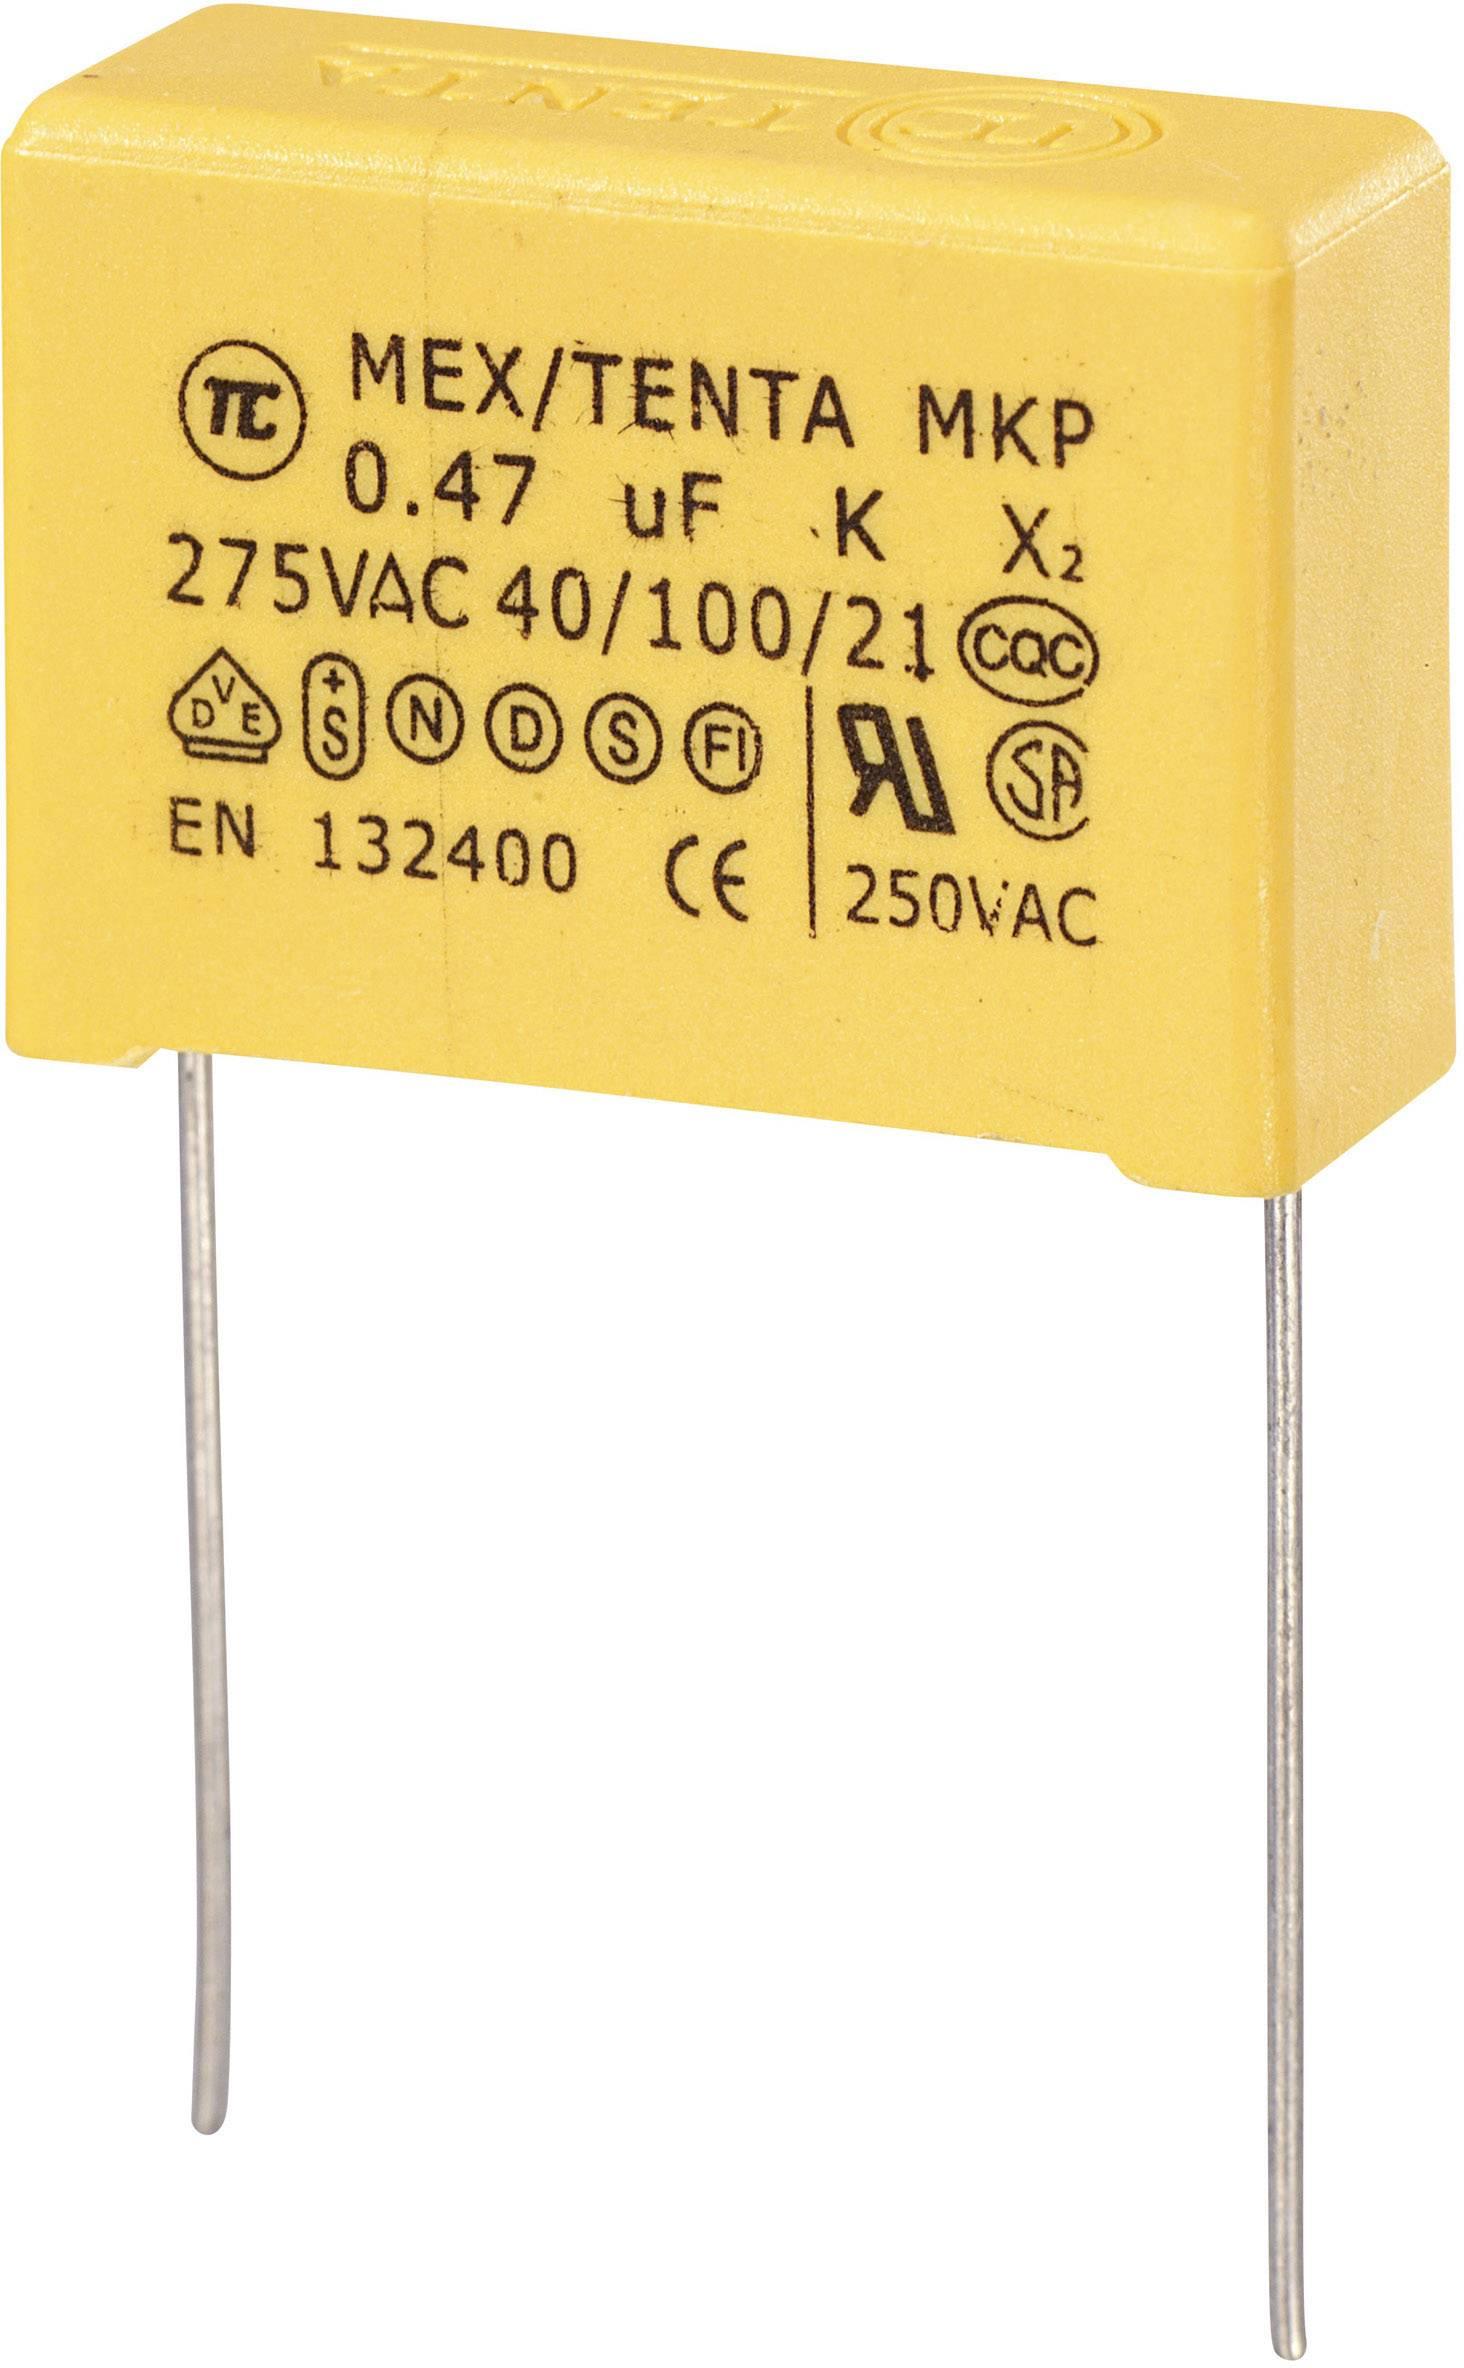 Foliový kondenzátor MKP, 0,47 µF, X2 275 V/AC, 10 %, 26,5 x 8,5 x 17 mm